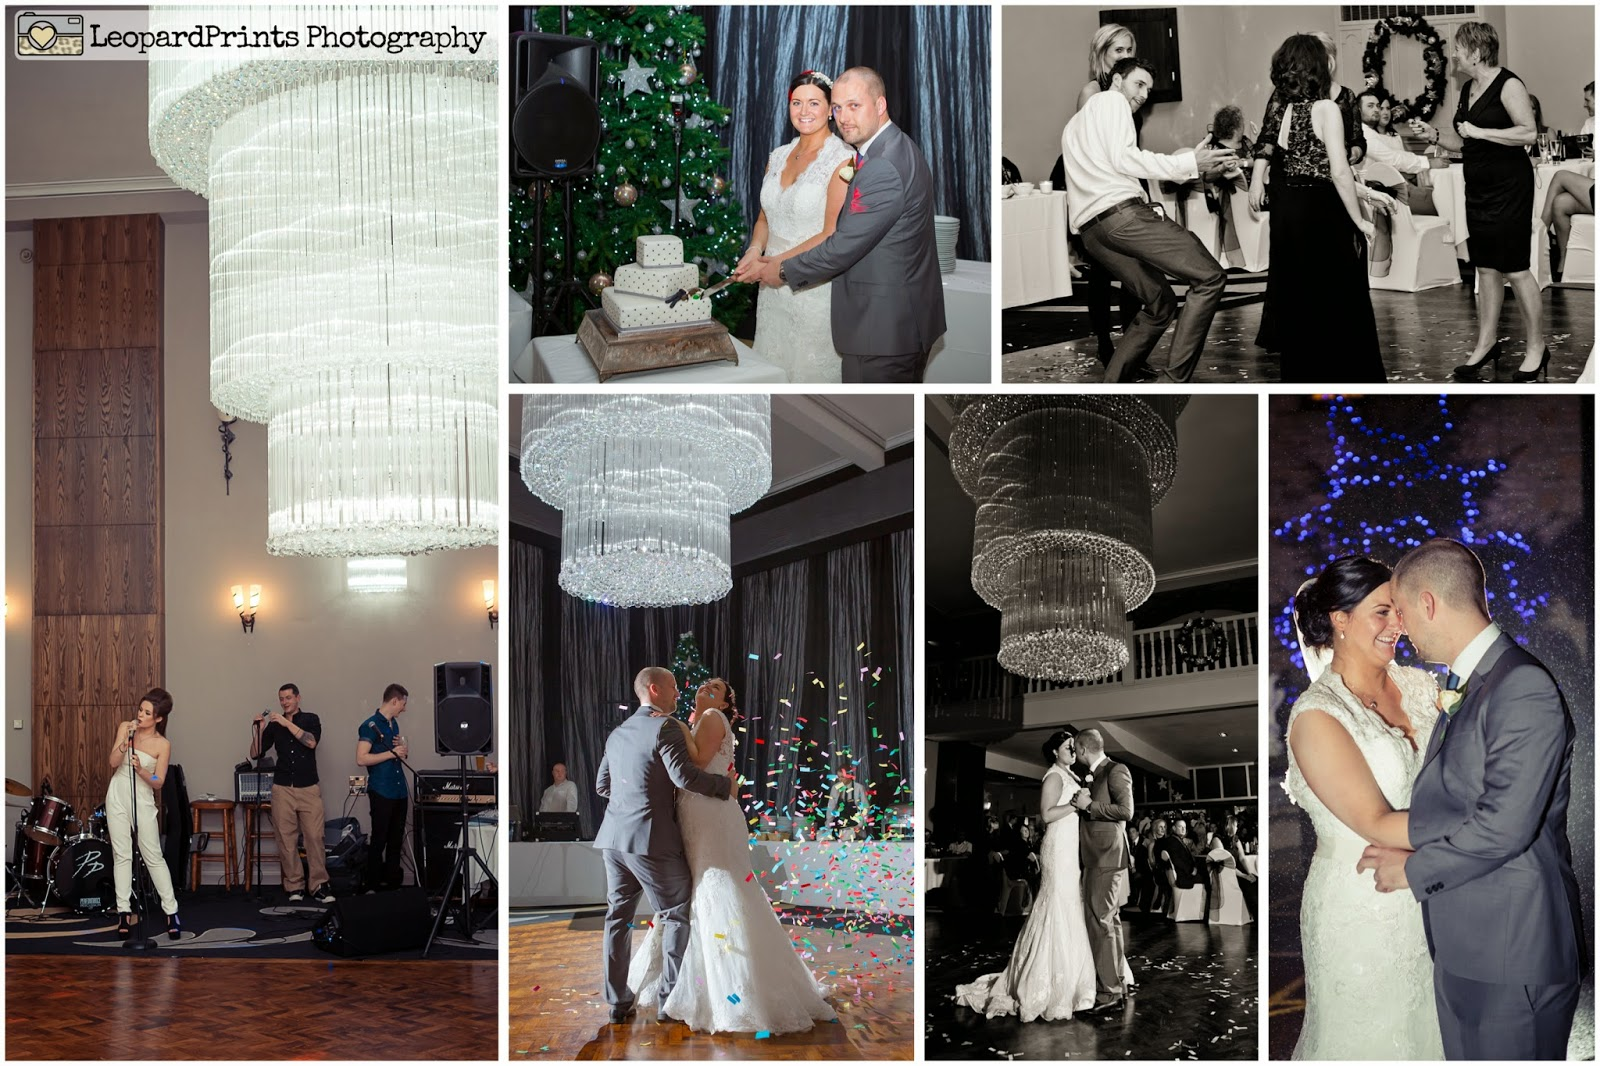 Evening reception, wedding couple dance beneath the chandelier in the grand hall at derwent manor